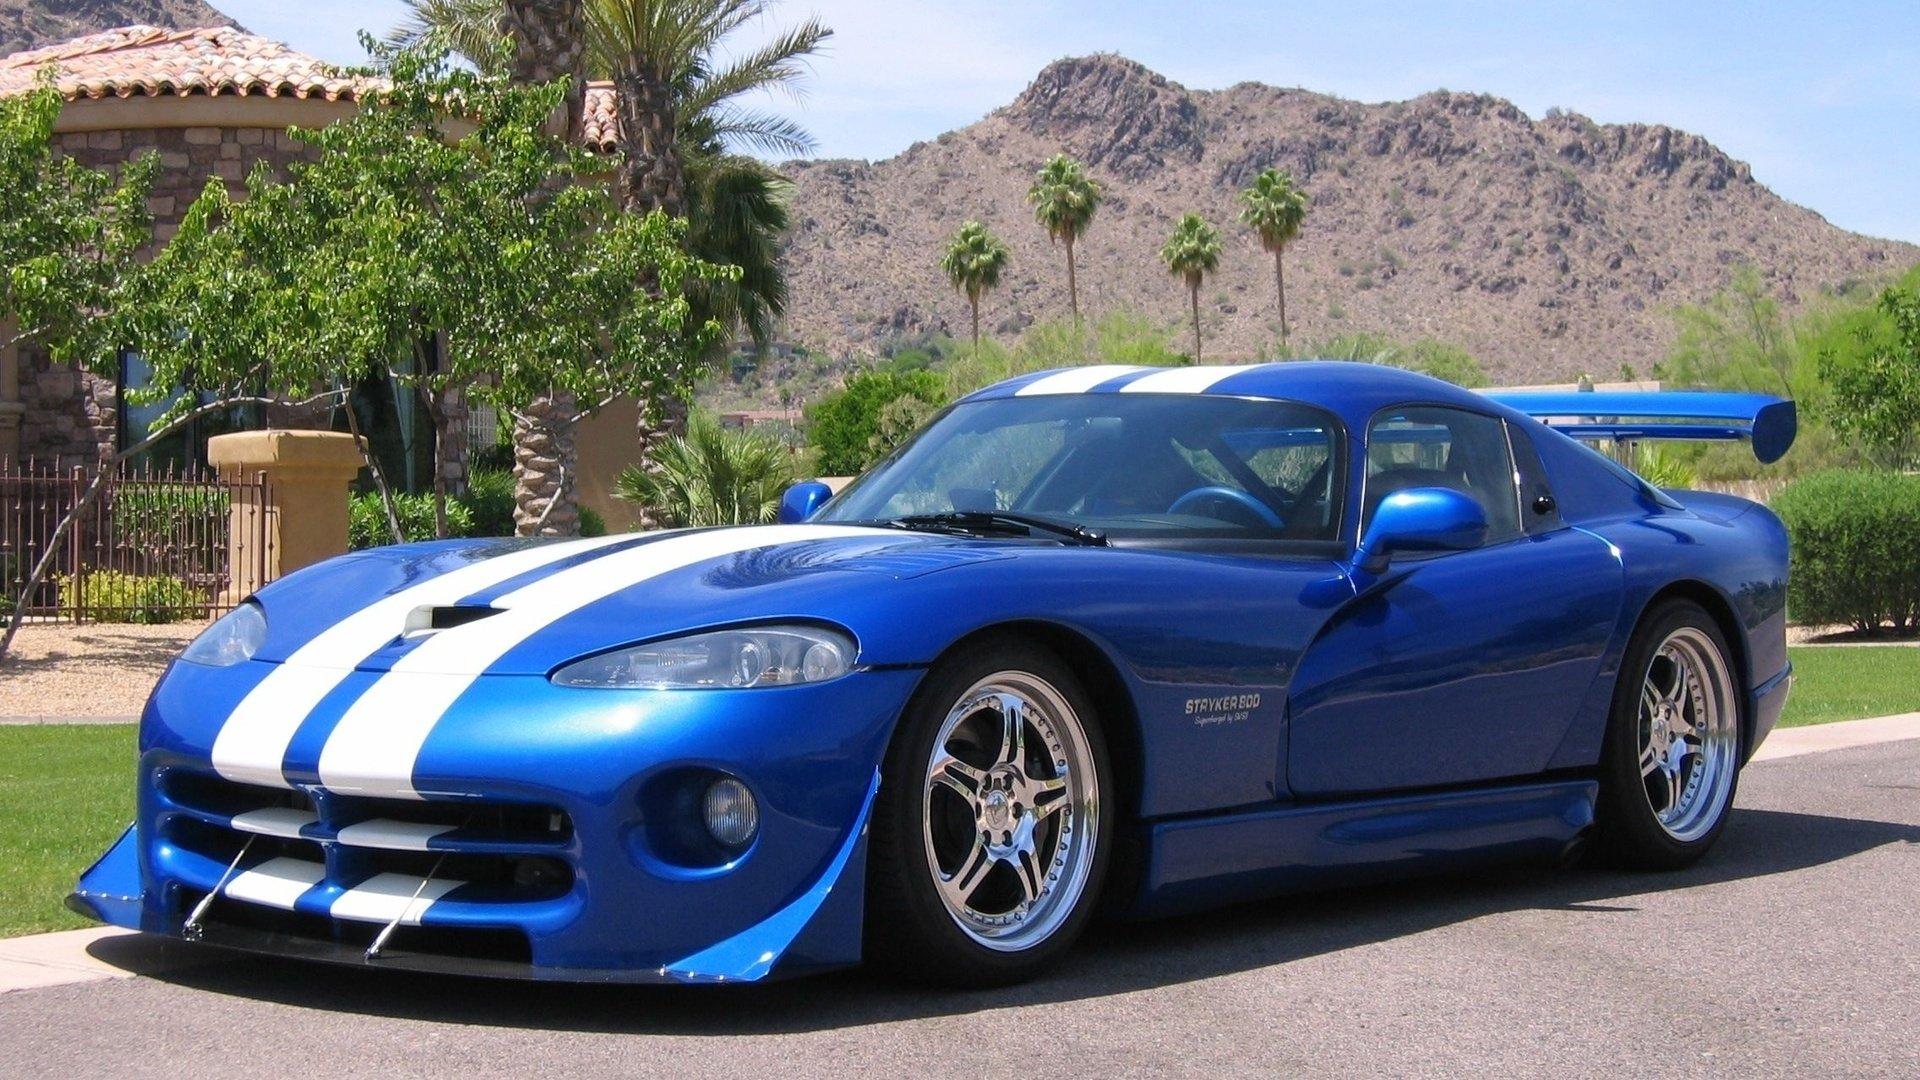 Wallpaper dodge viper gts tuning car cars dodge cars large